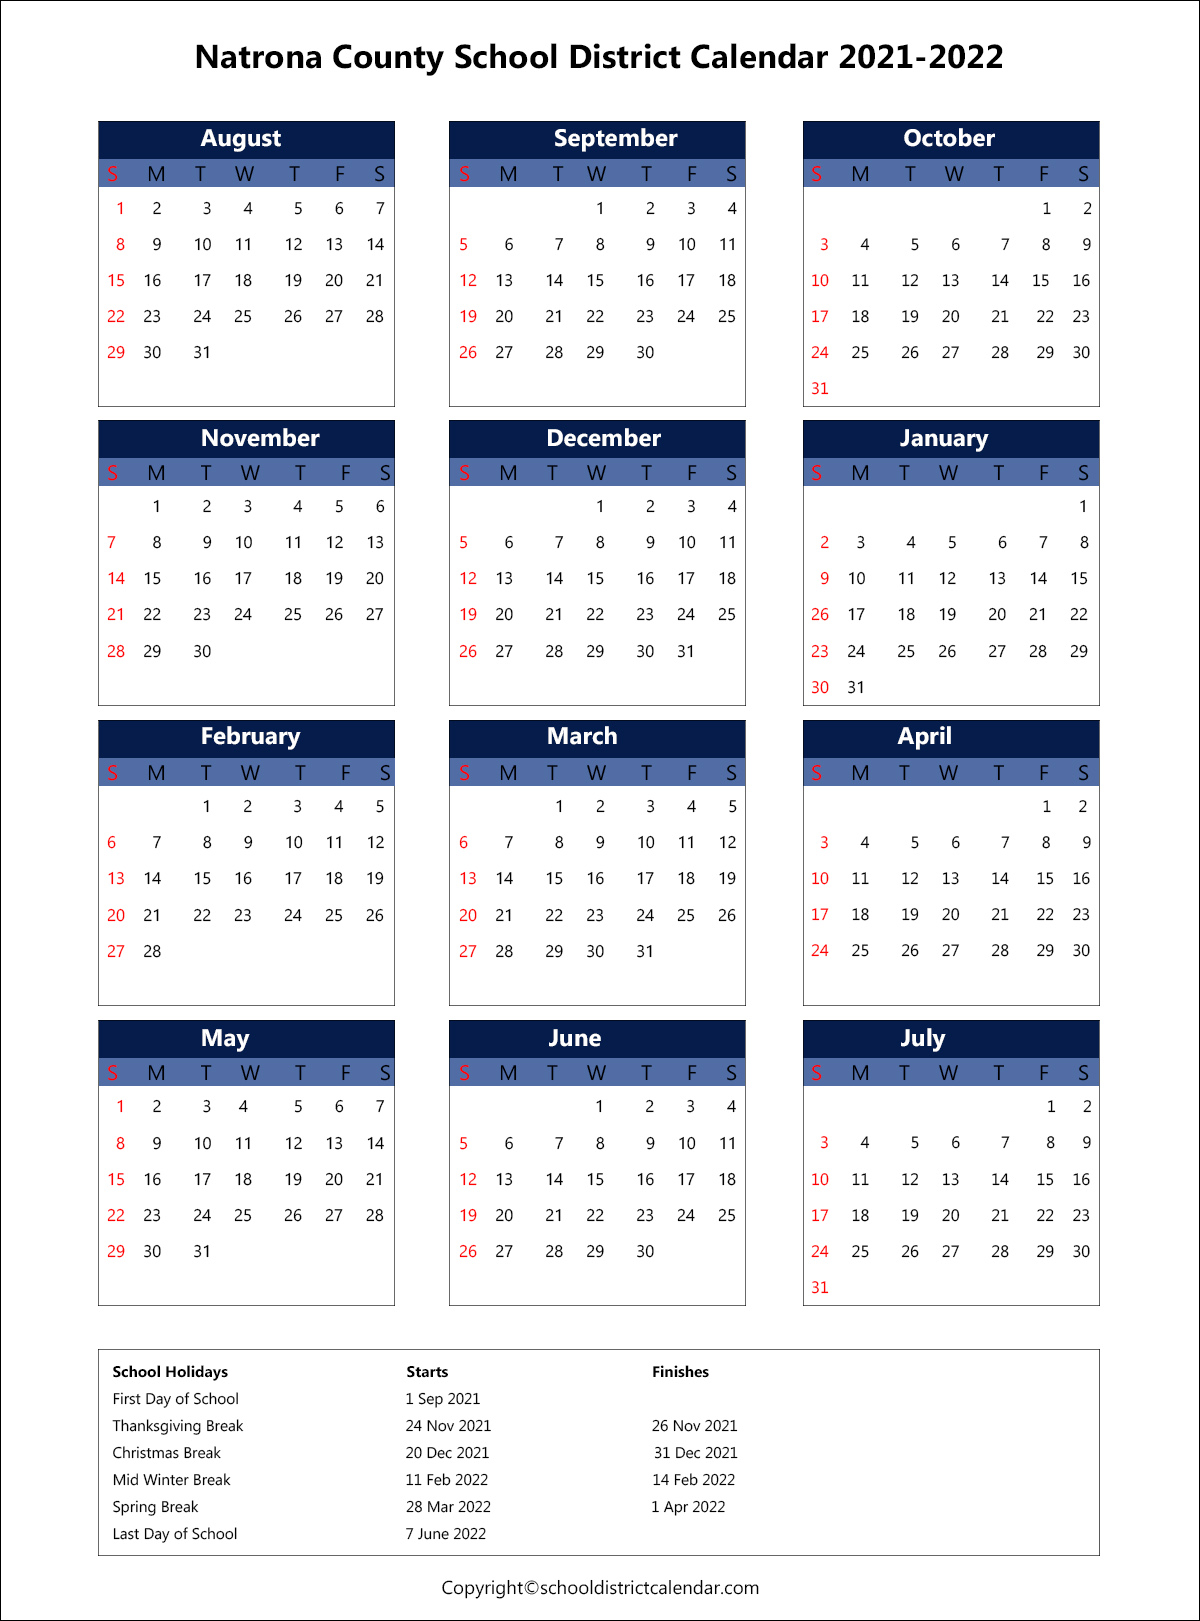 Natrona County School District Calendar 2021